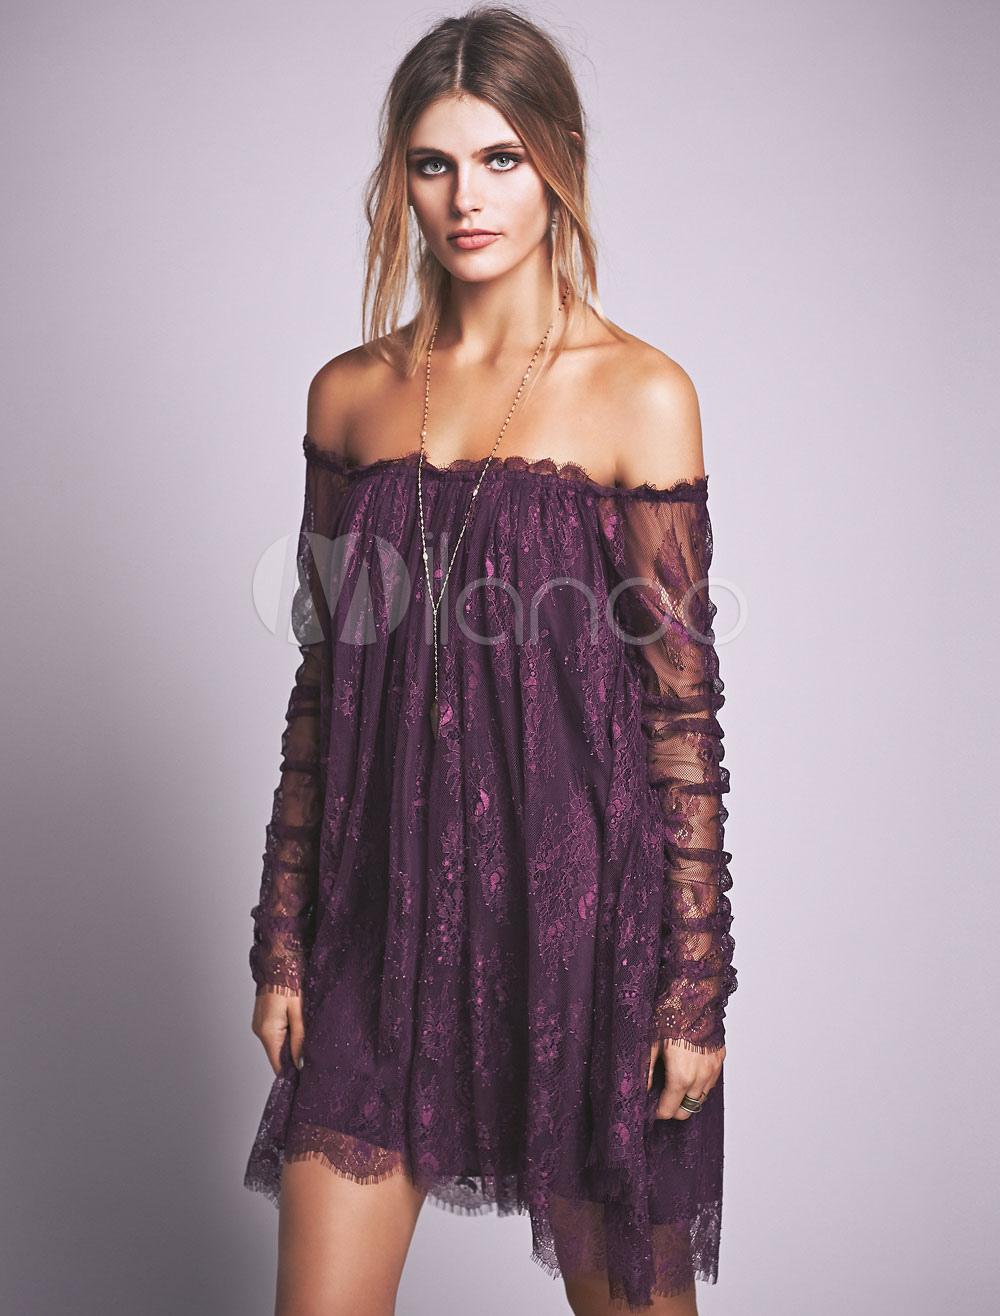 Lilac Lace Dress Off The Shoulder Long Sleeve Semi-Sheer Irregular Short Dress (Women\\'s Clothing Lace Dresses) photo